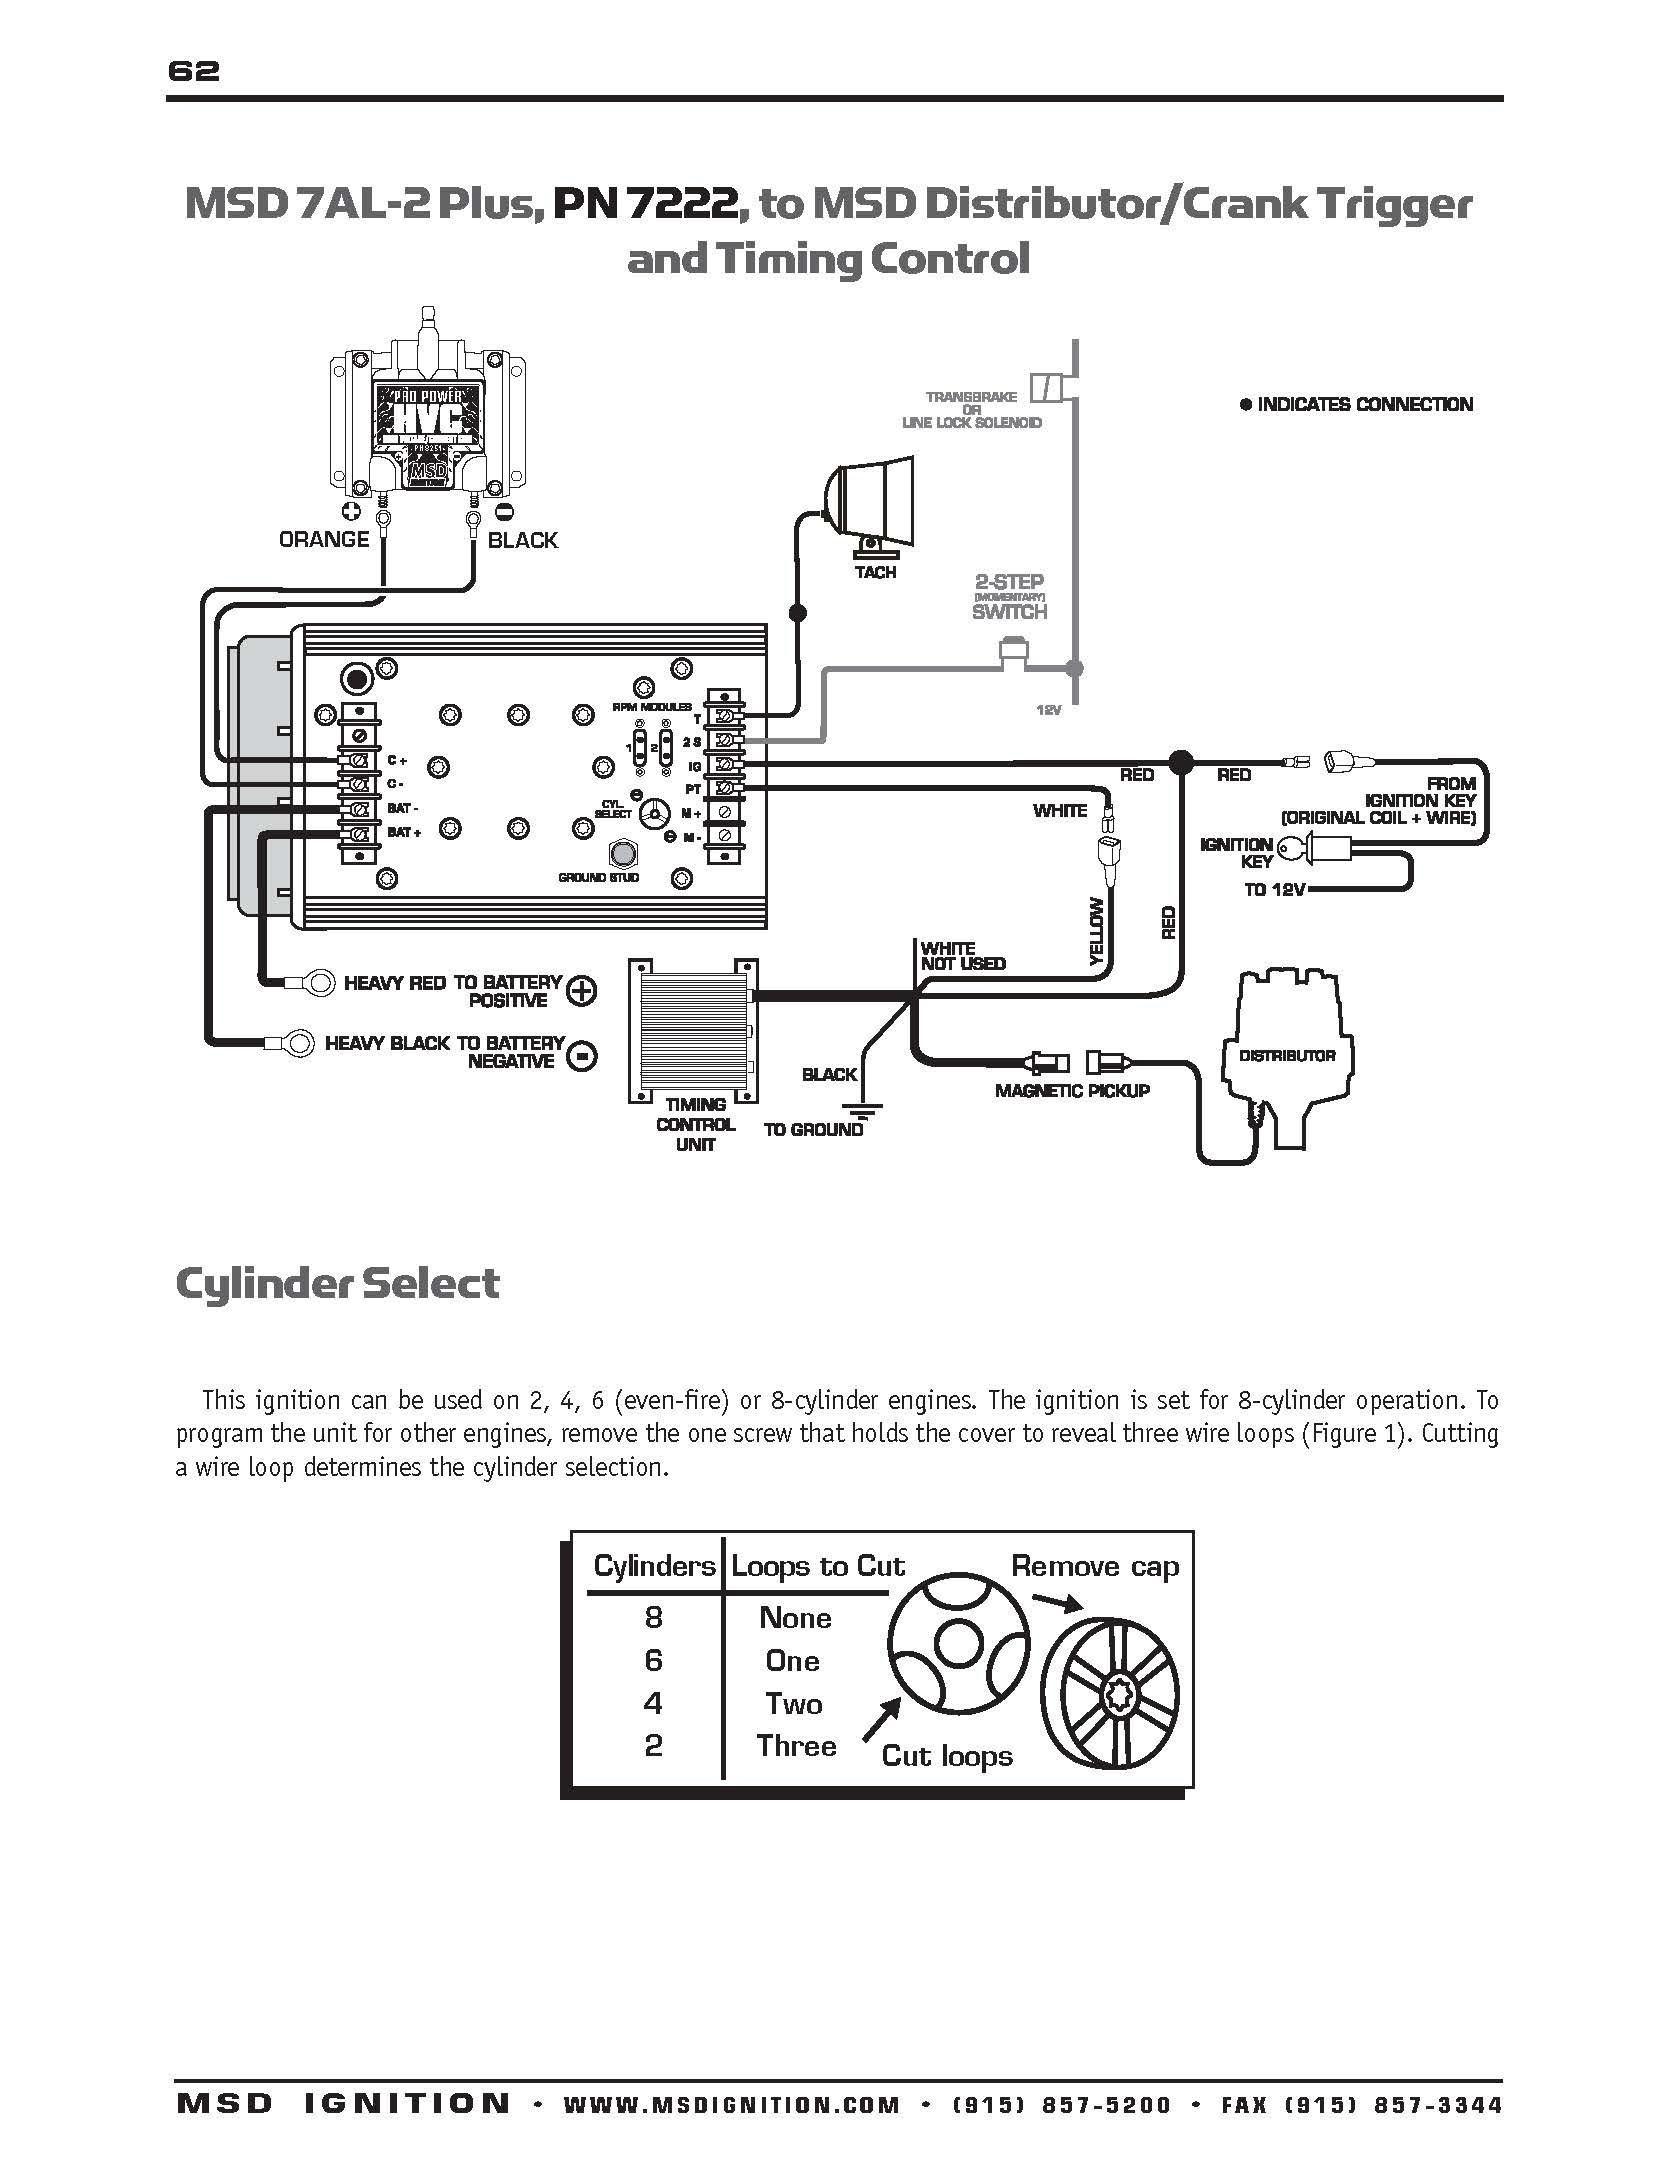 hight resolution of mallory hei distributor wiring diagram wiring diagrams femallory wiring diagram 351 iovegzgv newtrading info